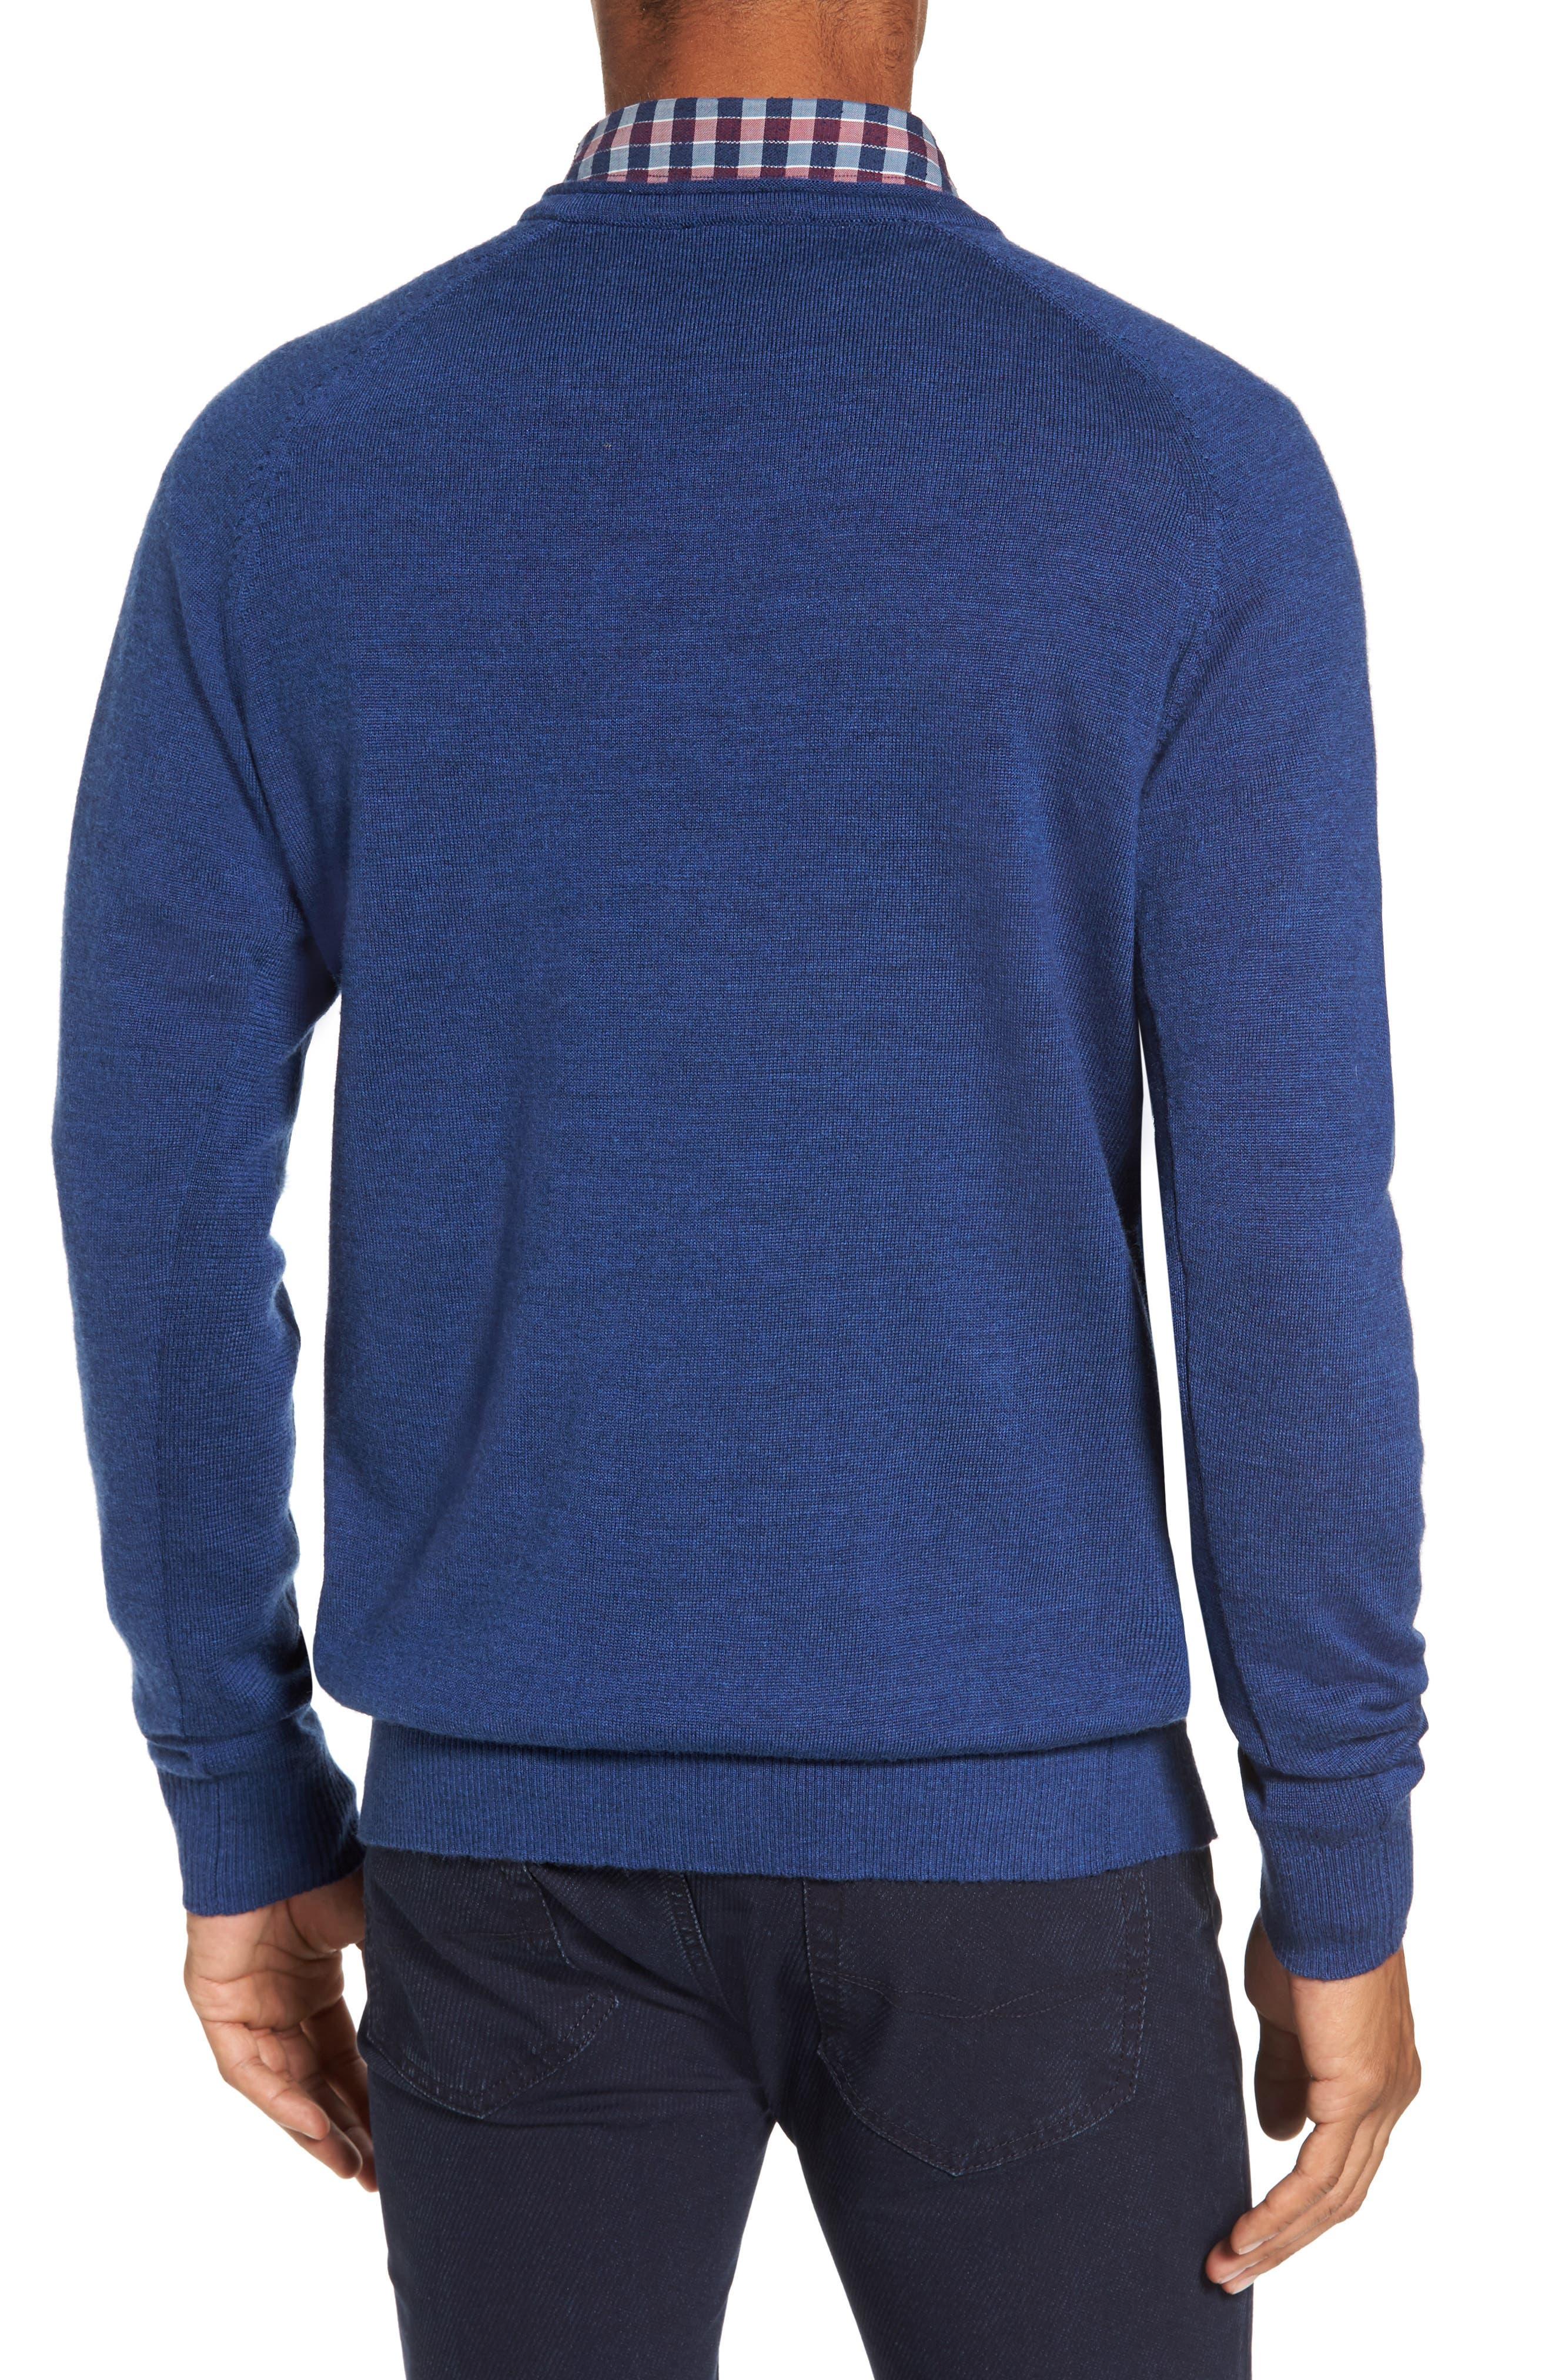 Burfield Wool Sweater,                             Alternate thumbnail 10, color,